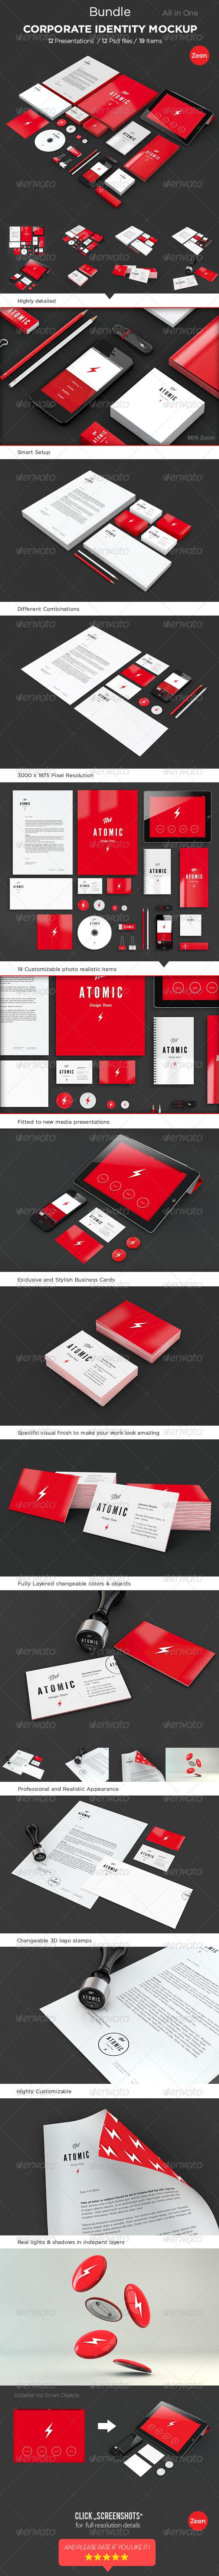 Corporate Identity Mockup Bundle